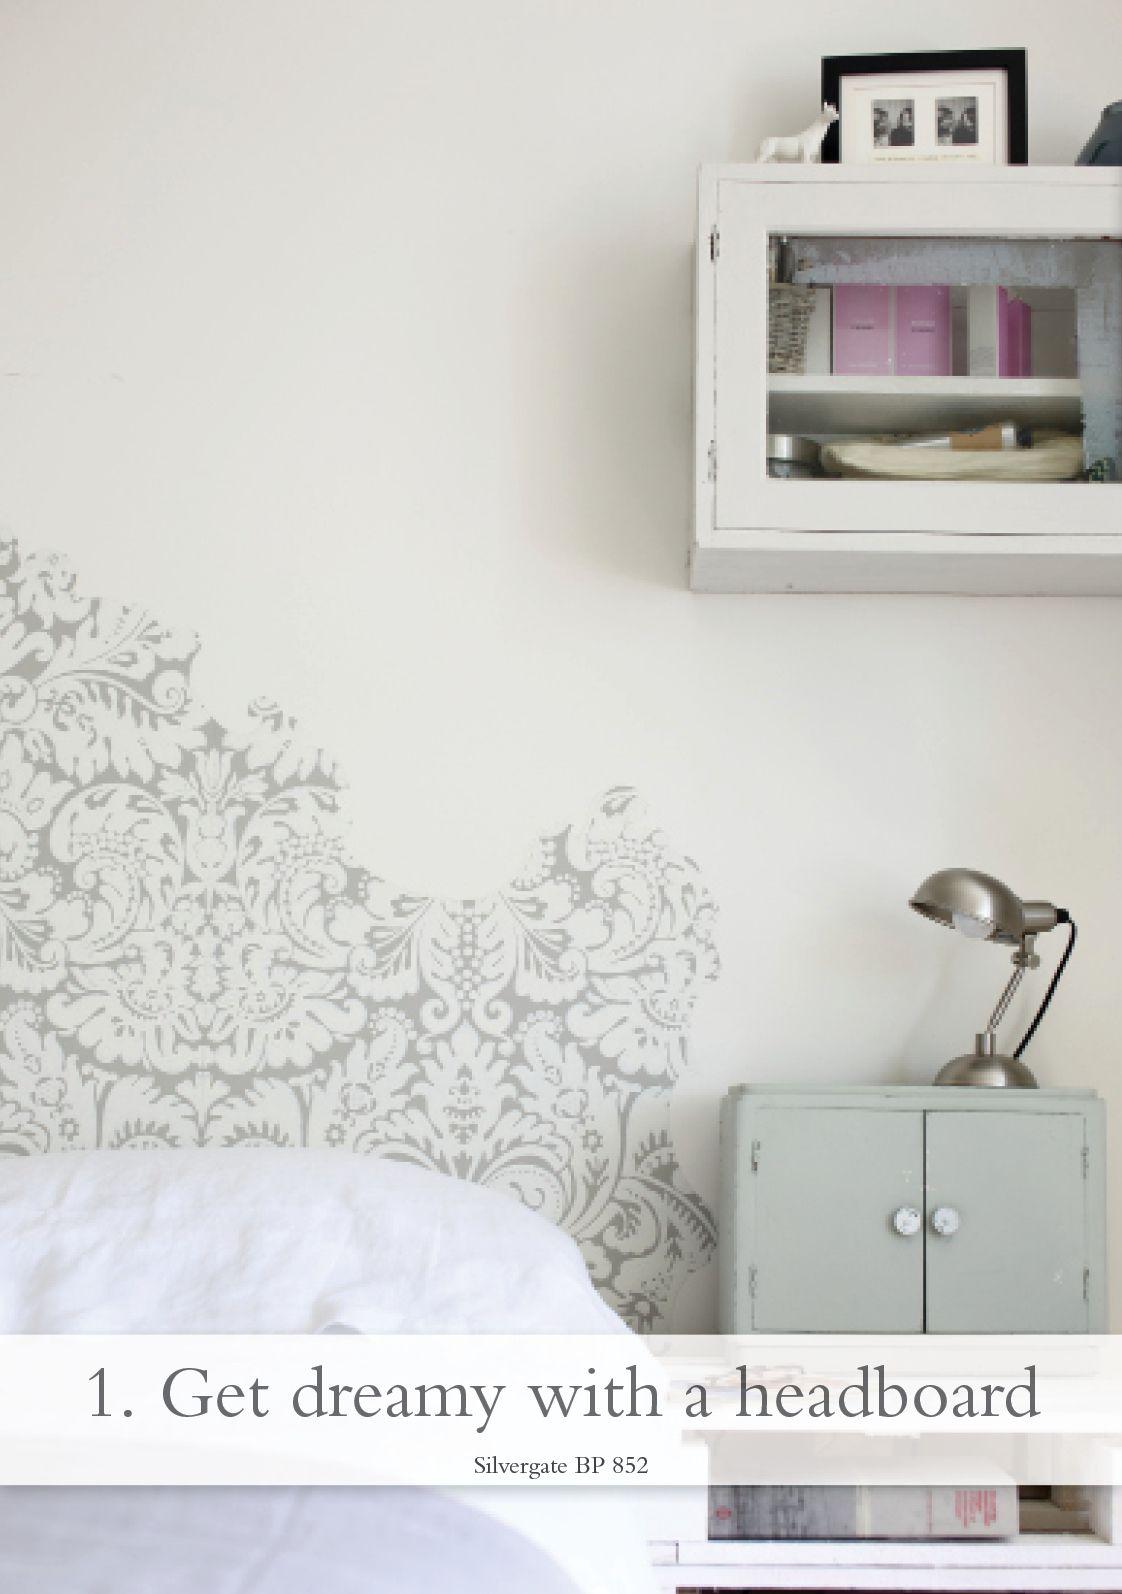 Get Dreamy With A Headboard 10 Ways With Wallpaper Wallpaper Headboard Small Bedroom Small Spaces